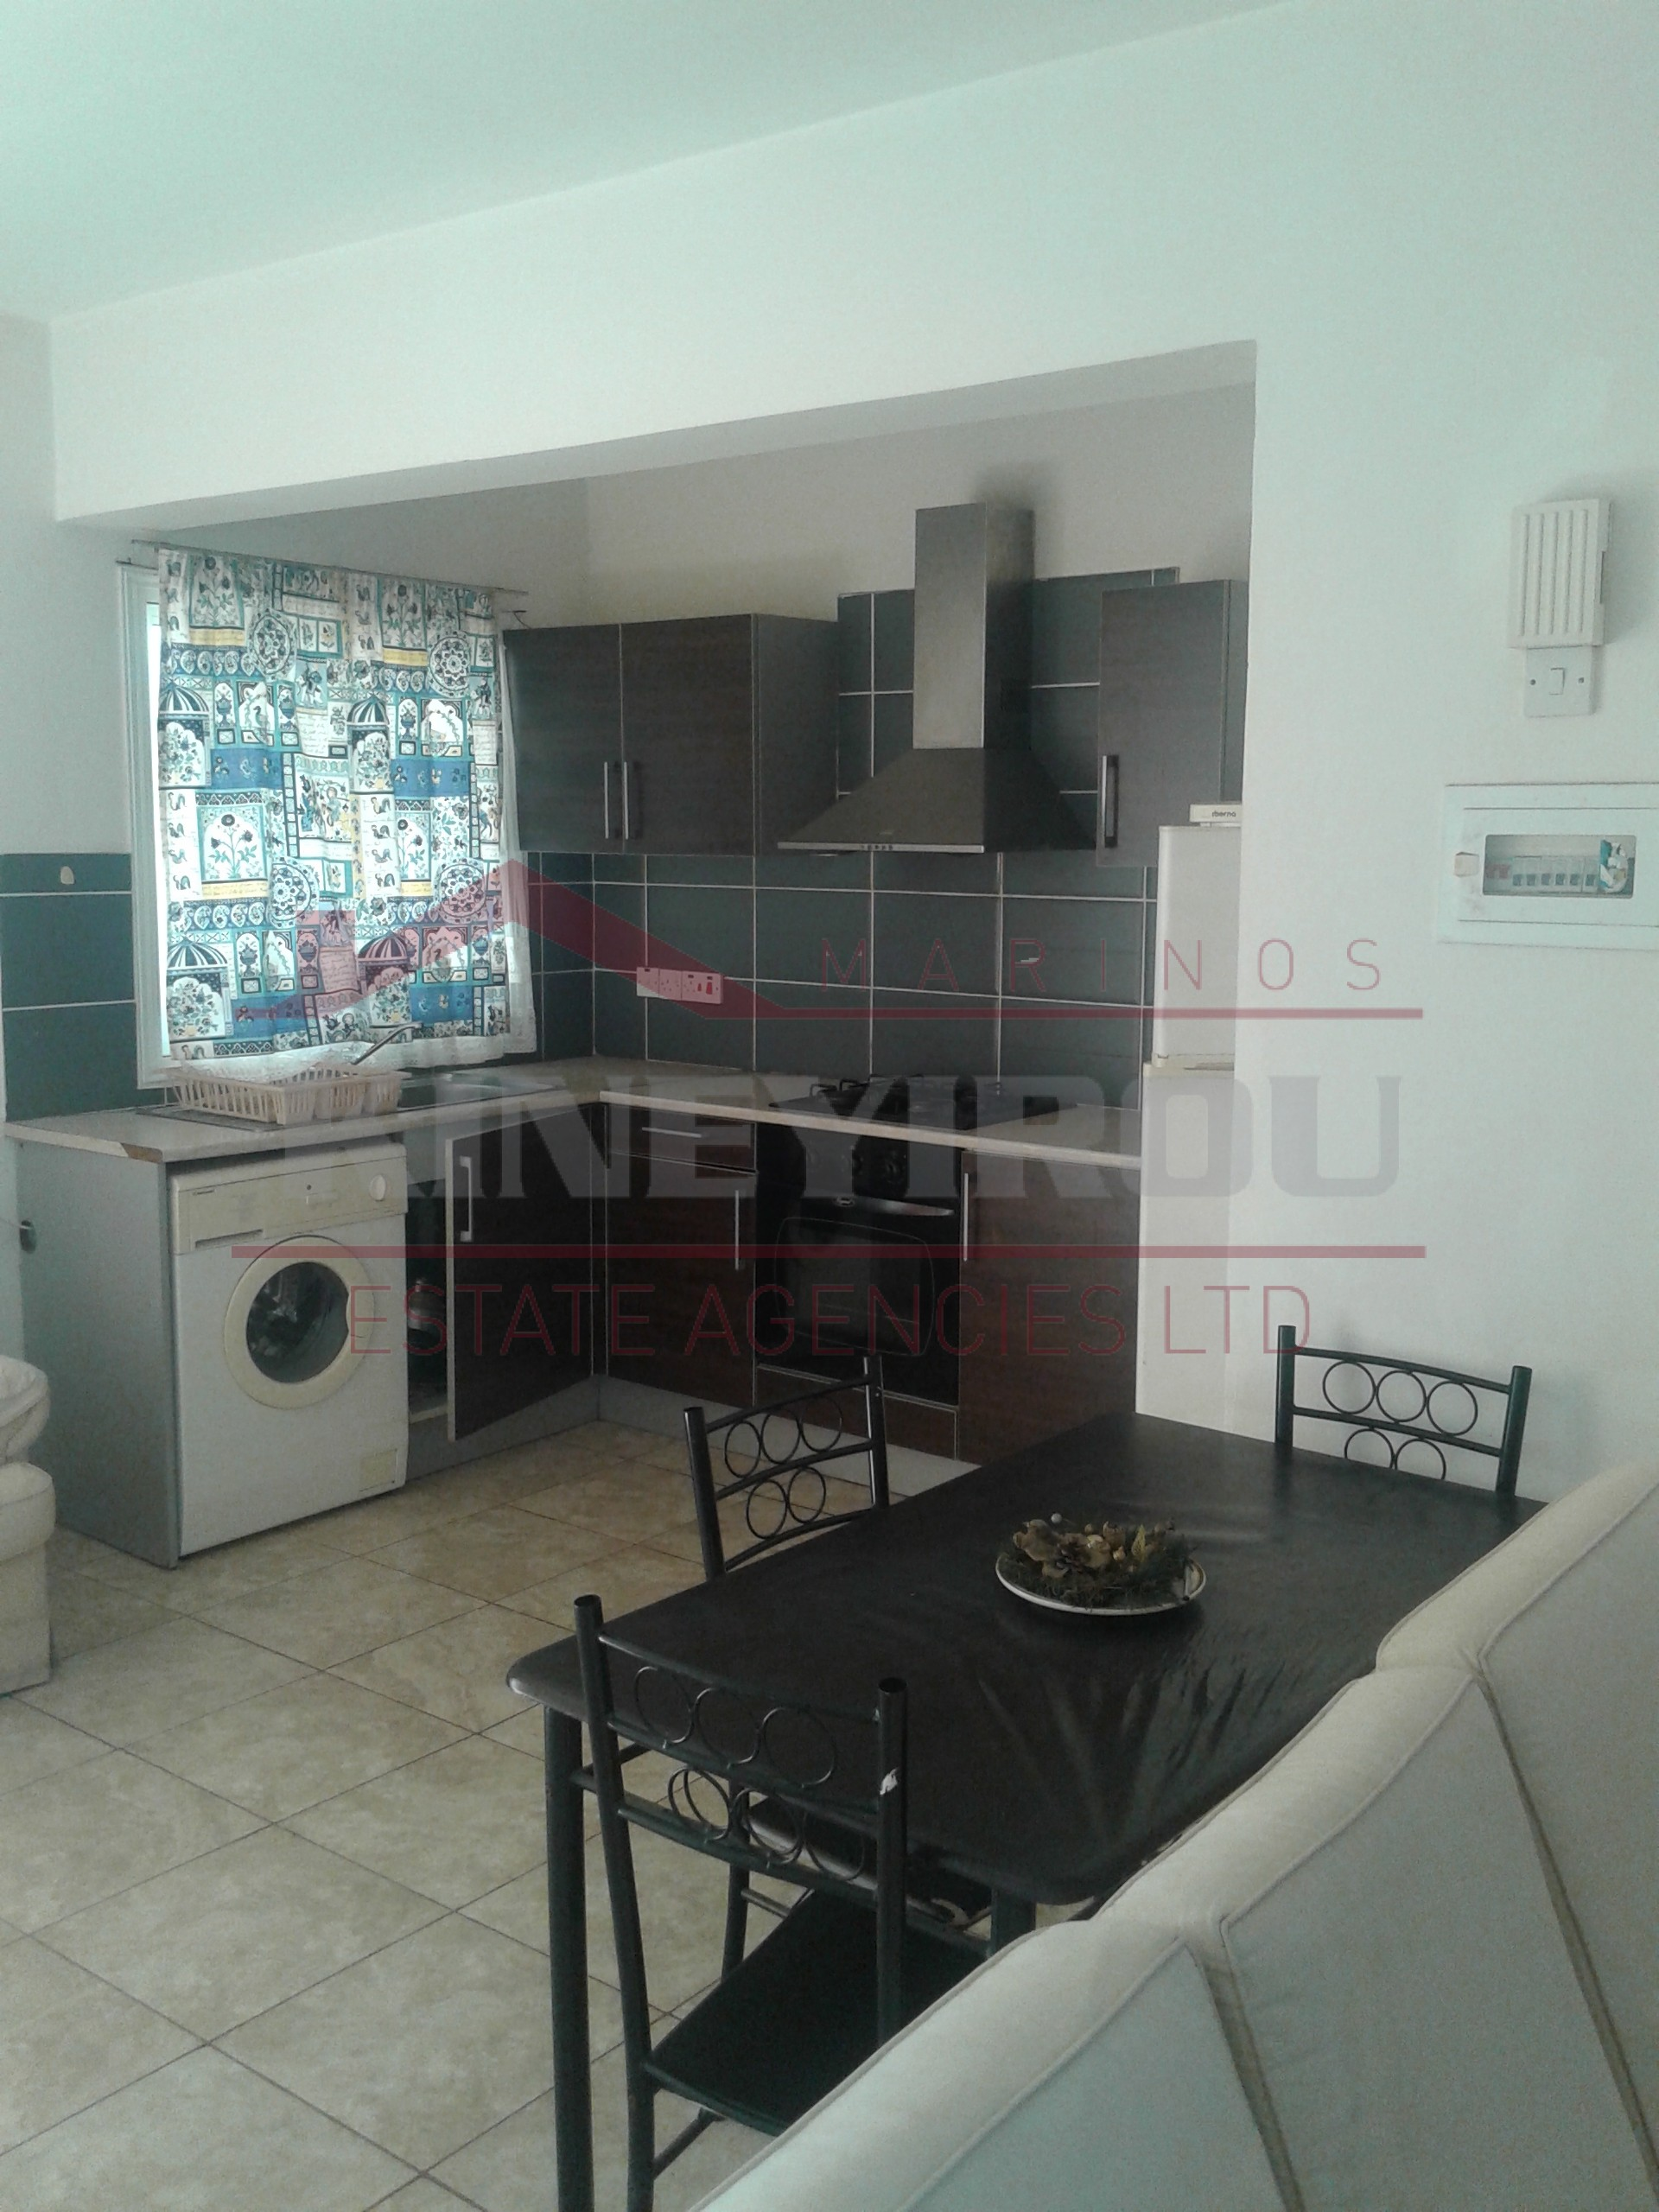 Larnaca property – One bedroom for sale